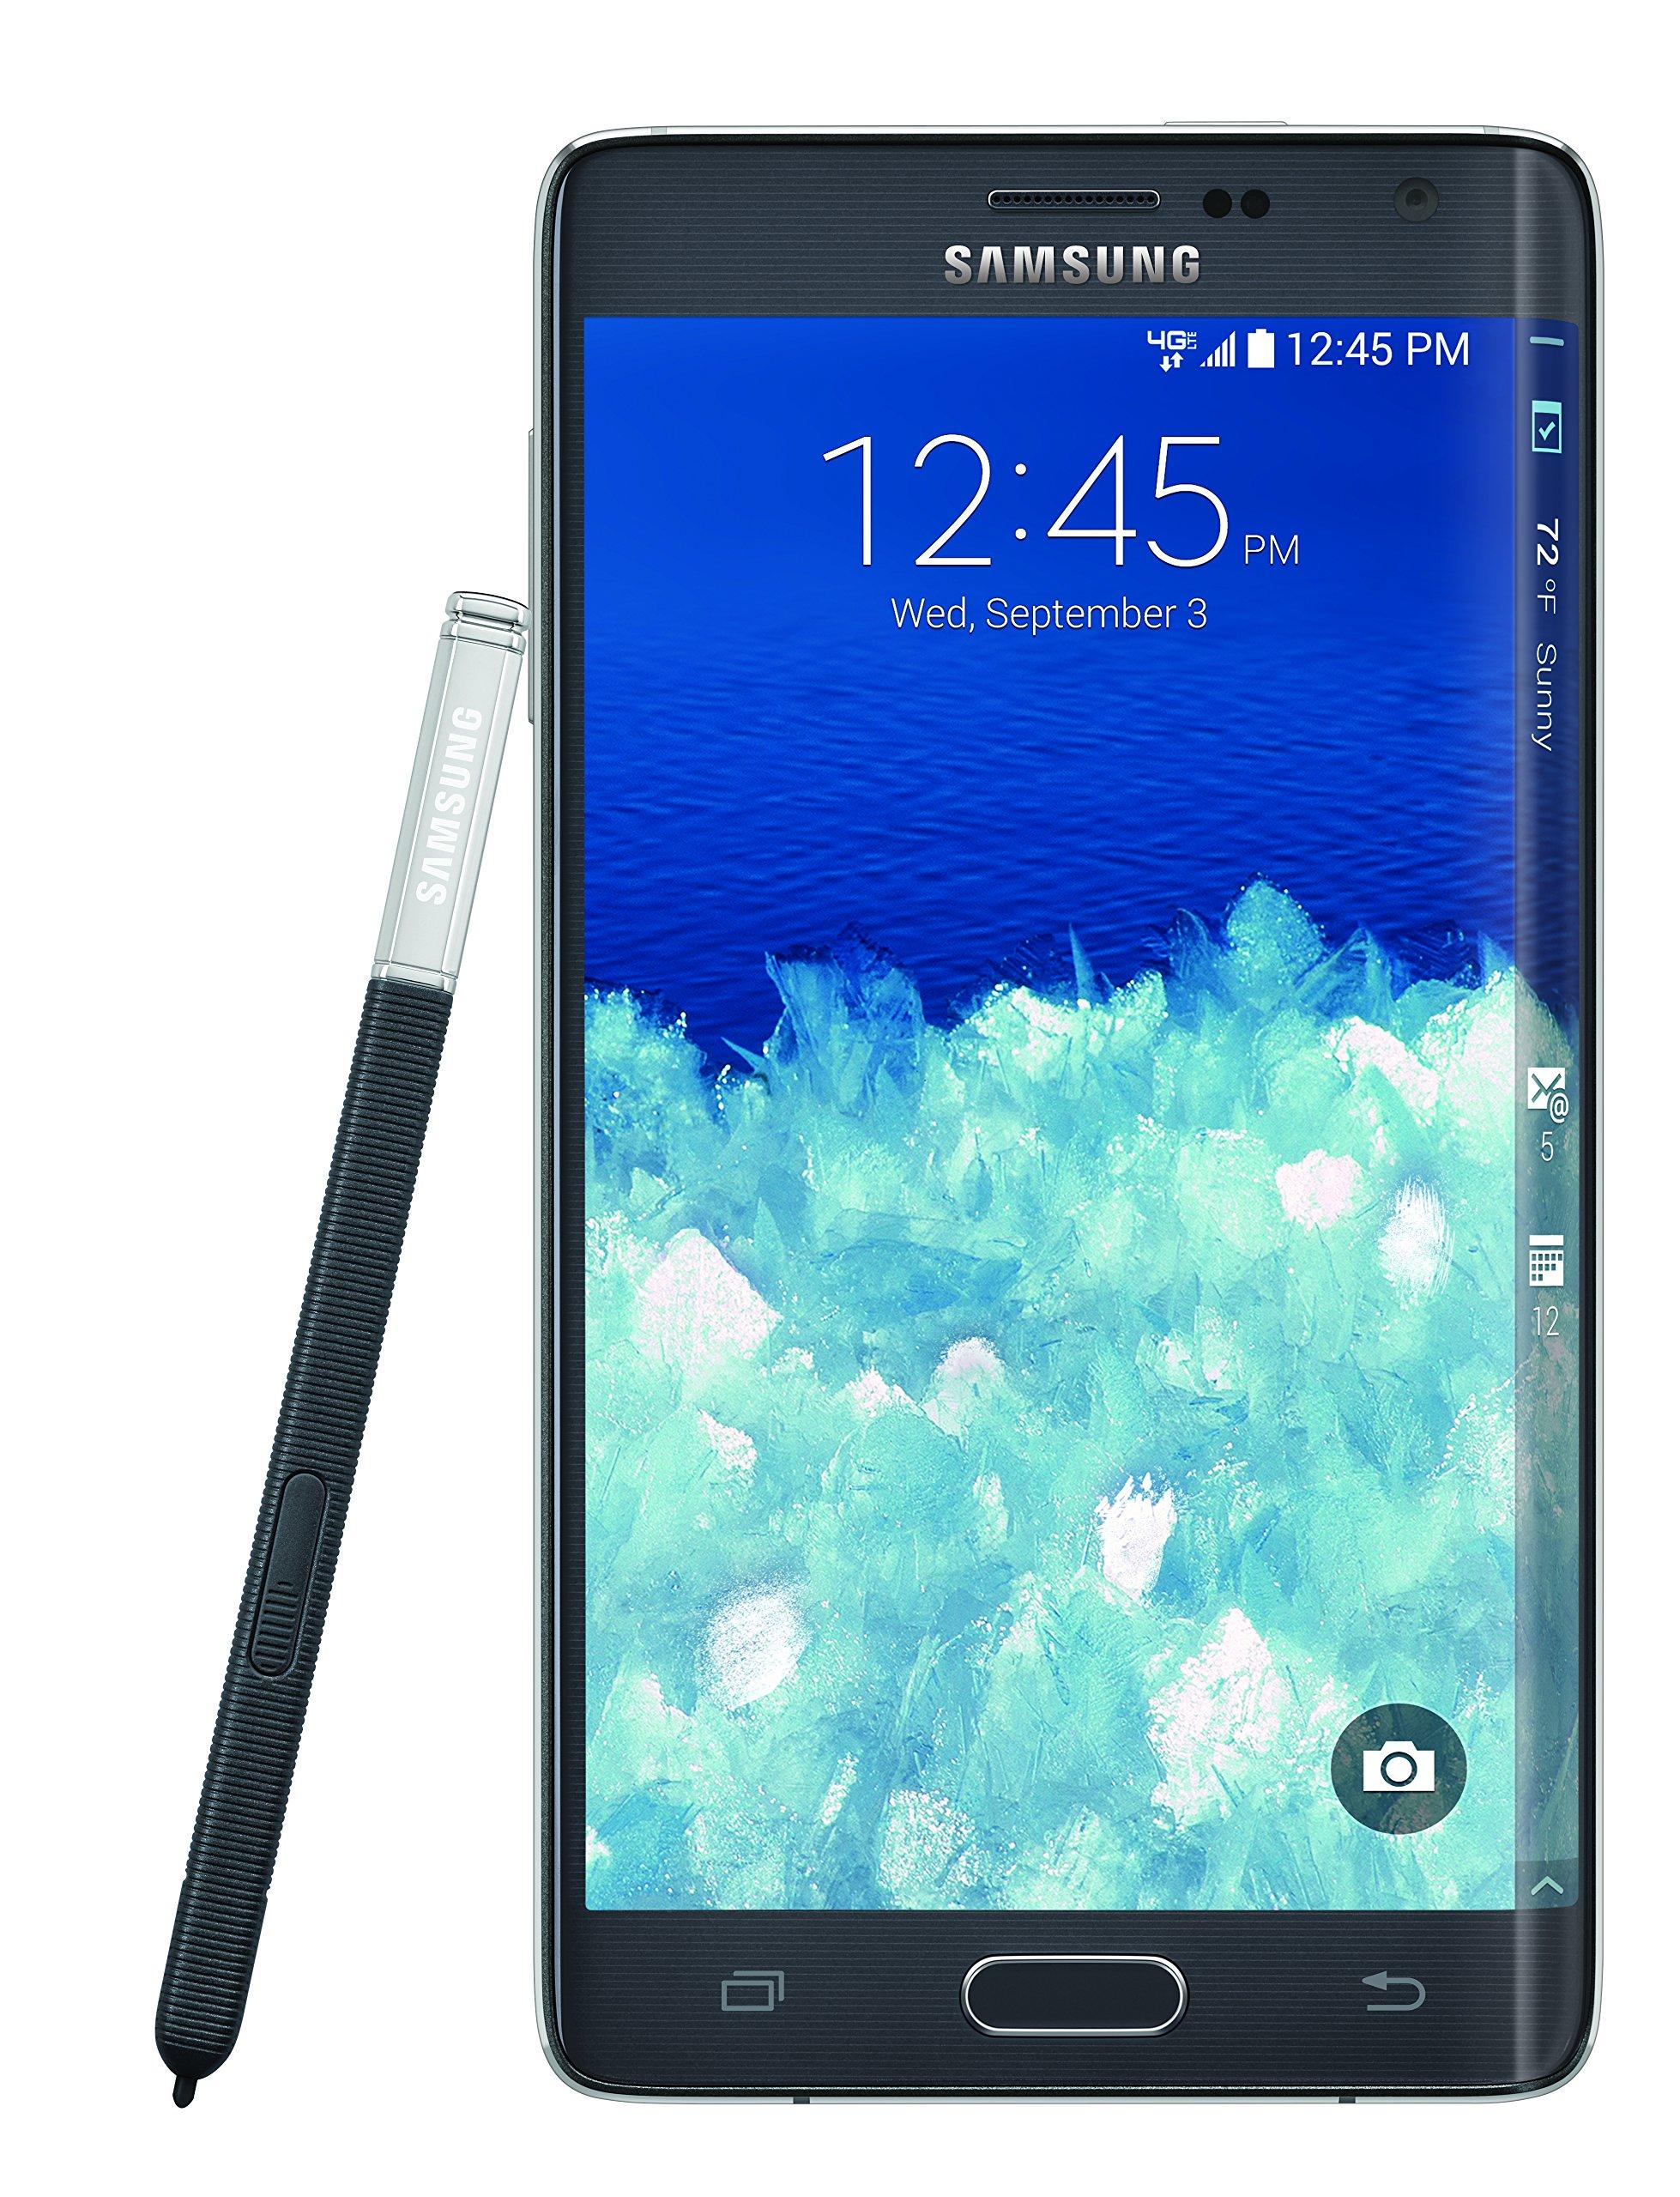 Samsung Galaxy Note 6 Edge: Amazon.com